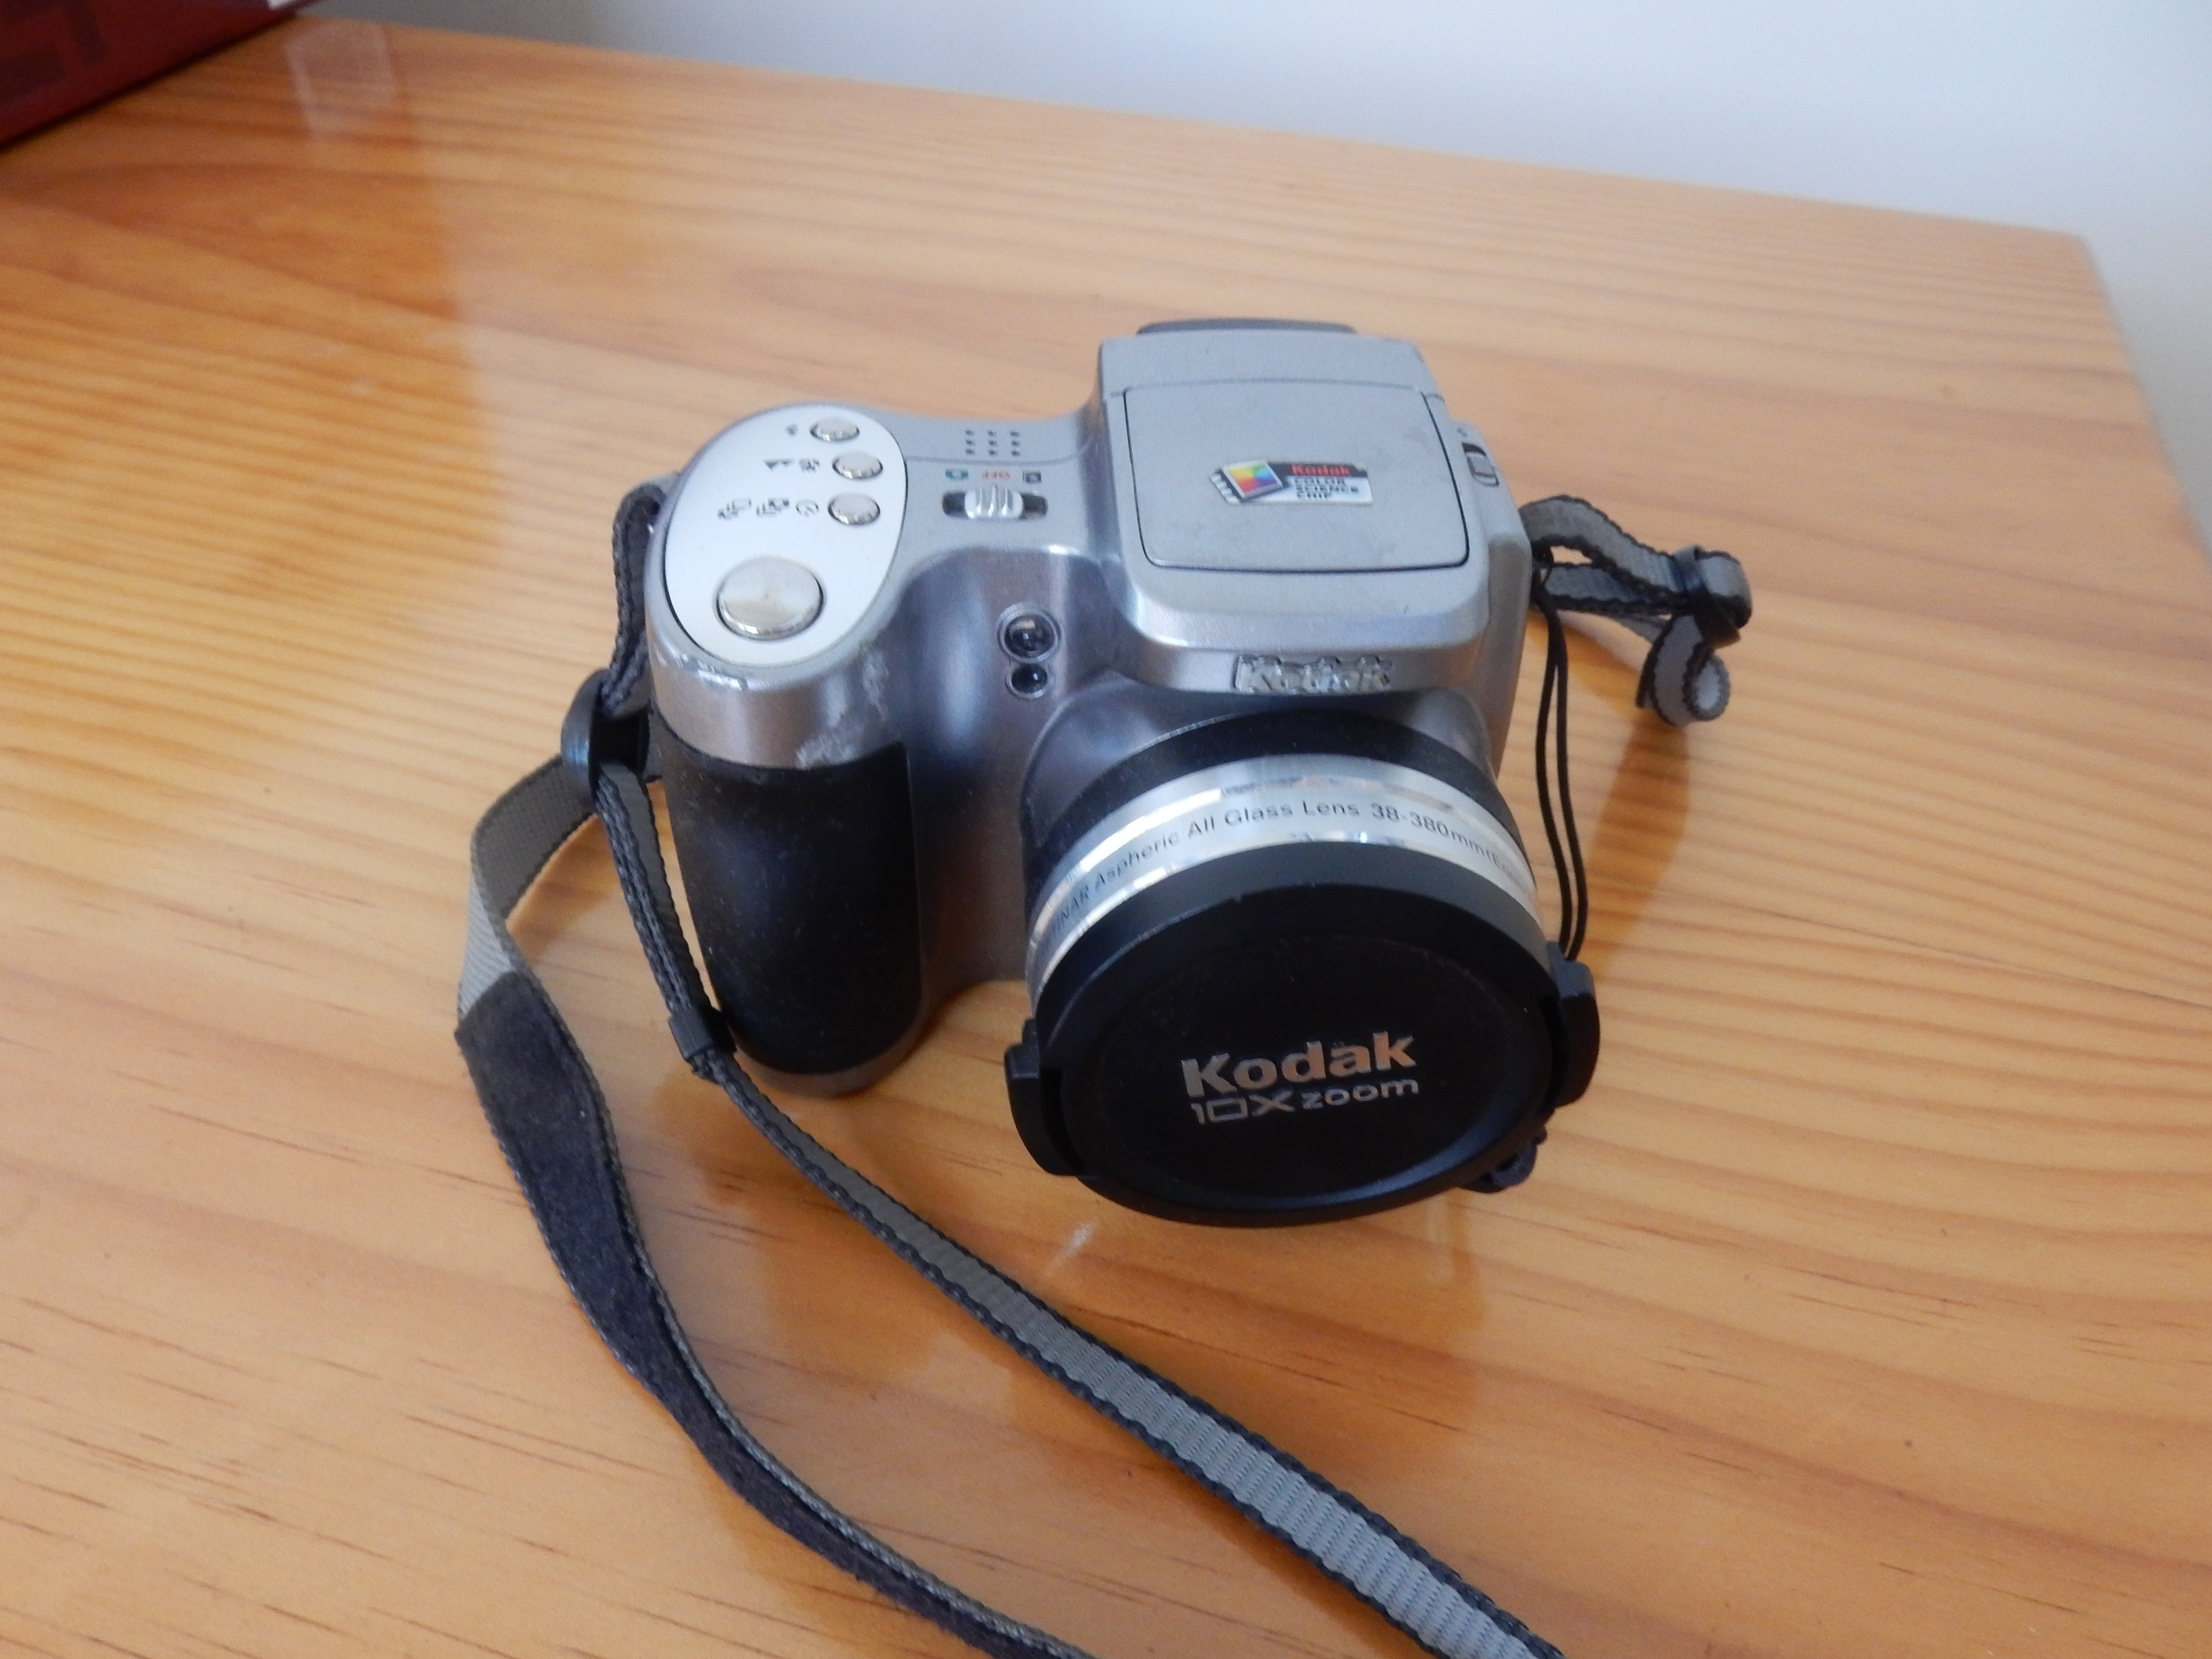 Kodak 10xzoom all glass lens 38-380mm easy display